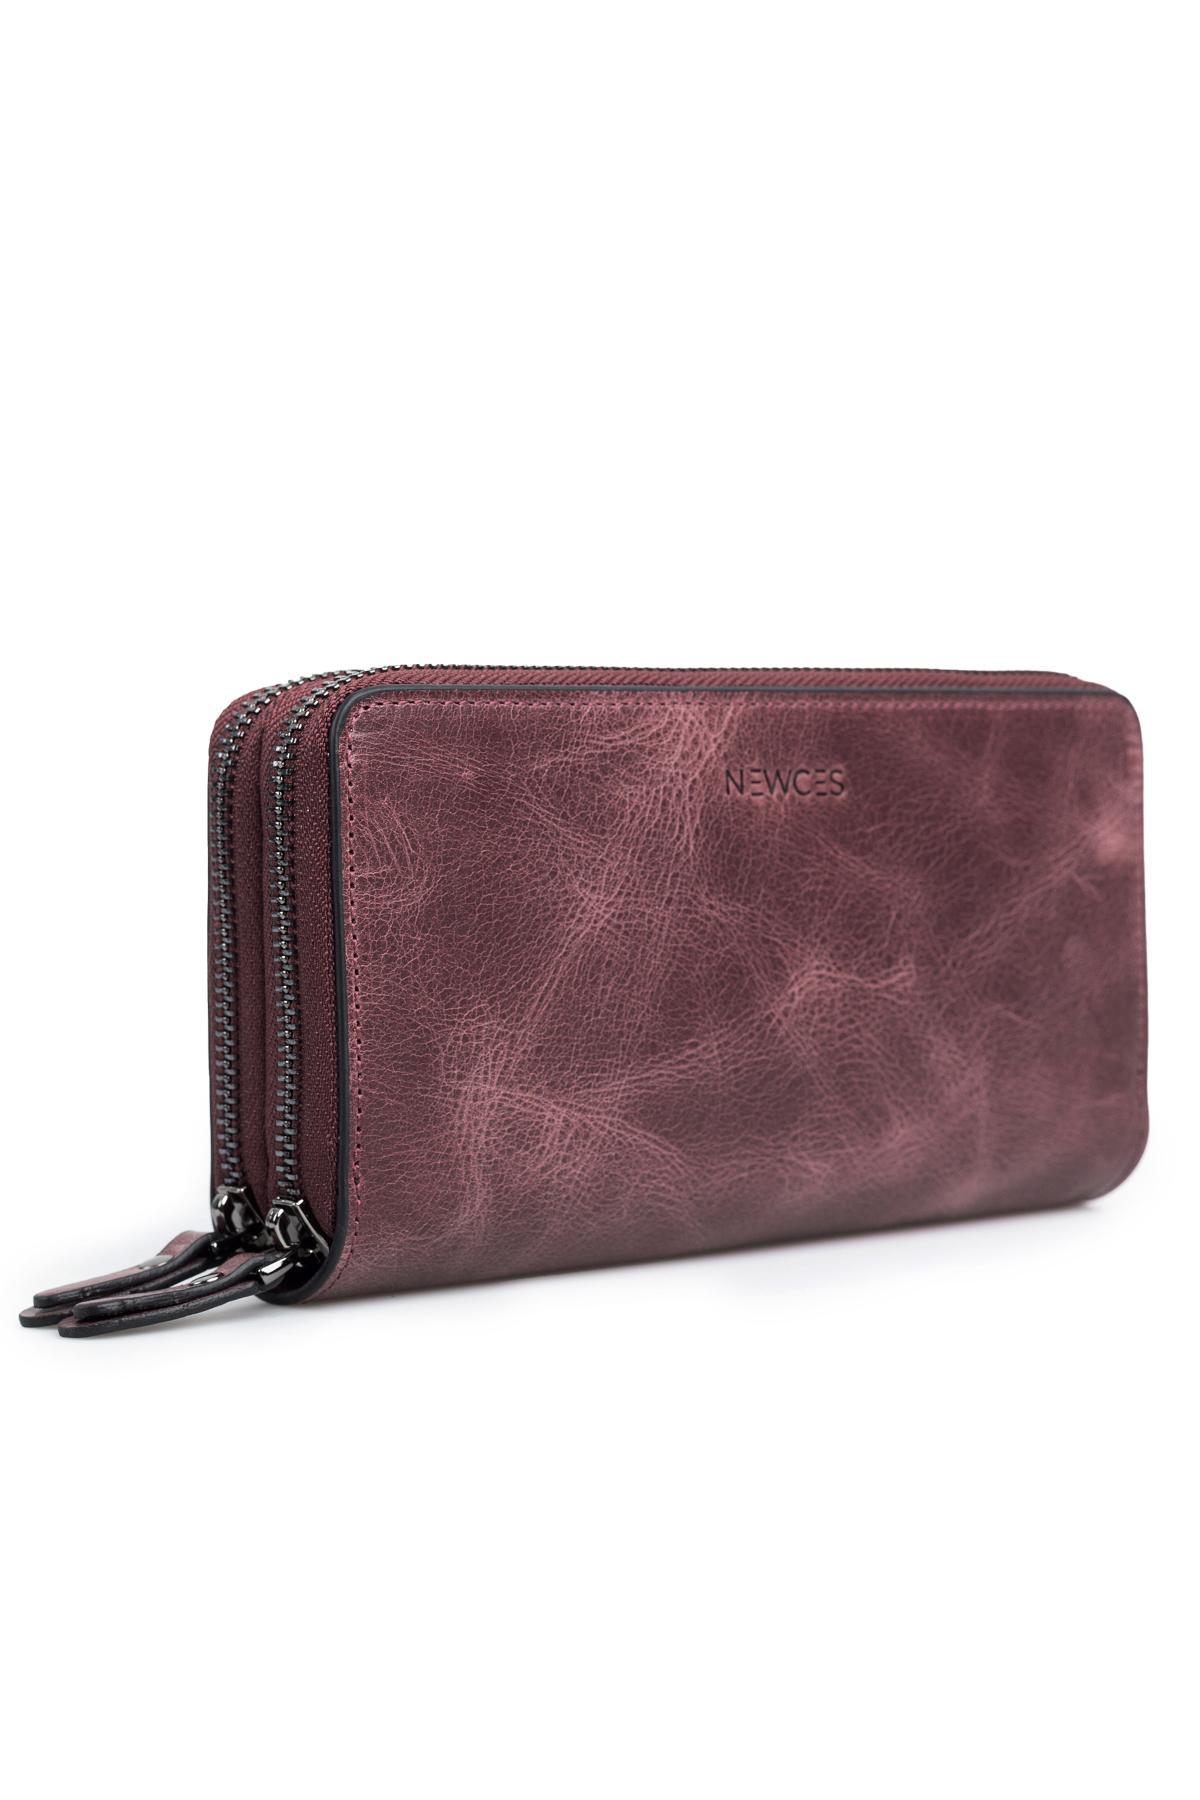 Double Zipper Money Portfolio Bag newces-007-BO